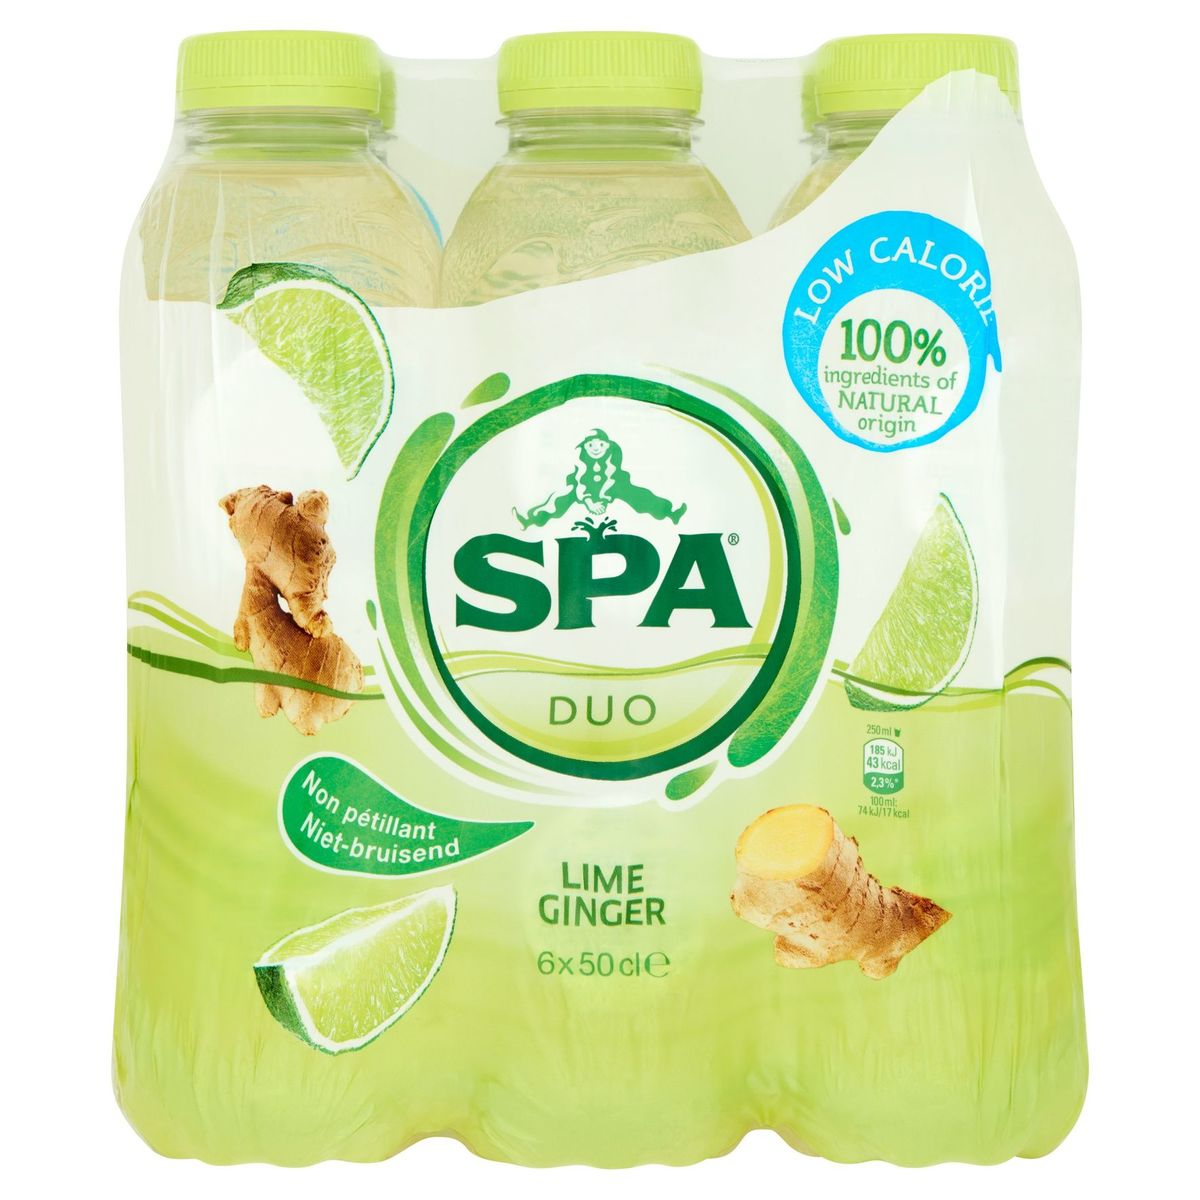 Spa Duo Limoen - Gember Niet-Bruisend PET 6 x 50 cl